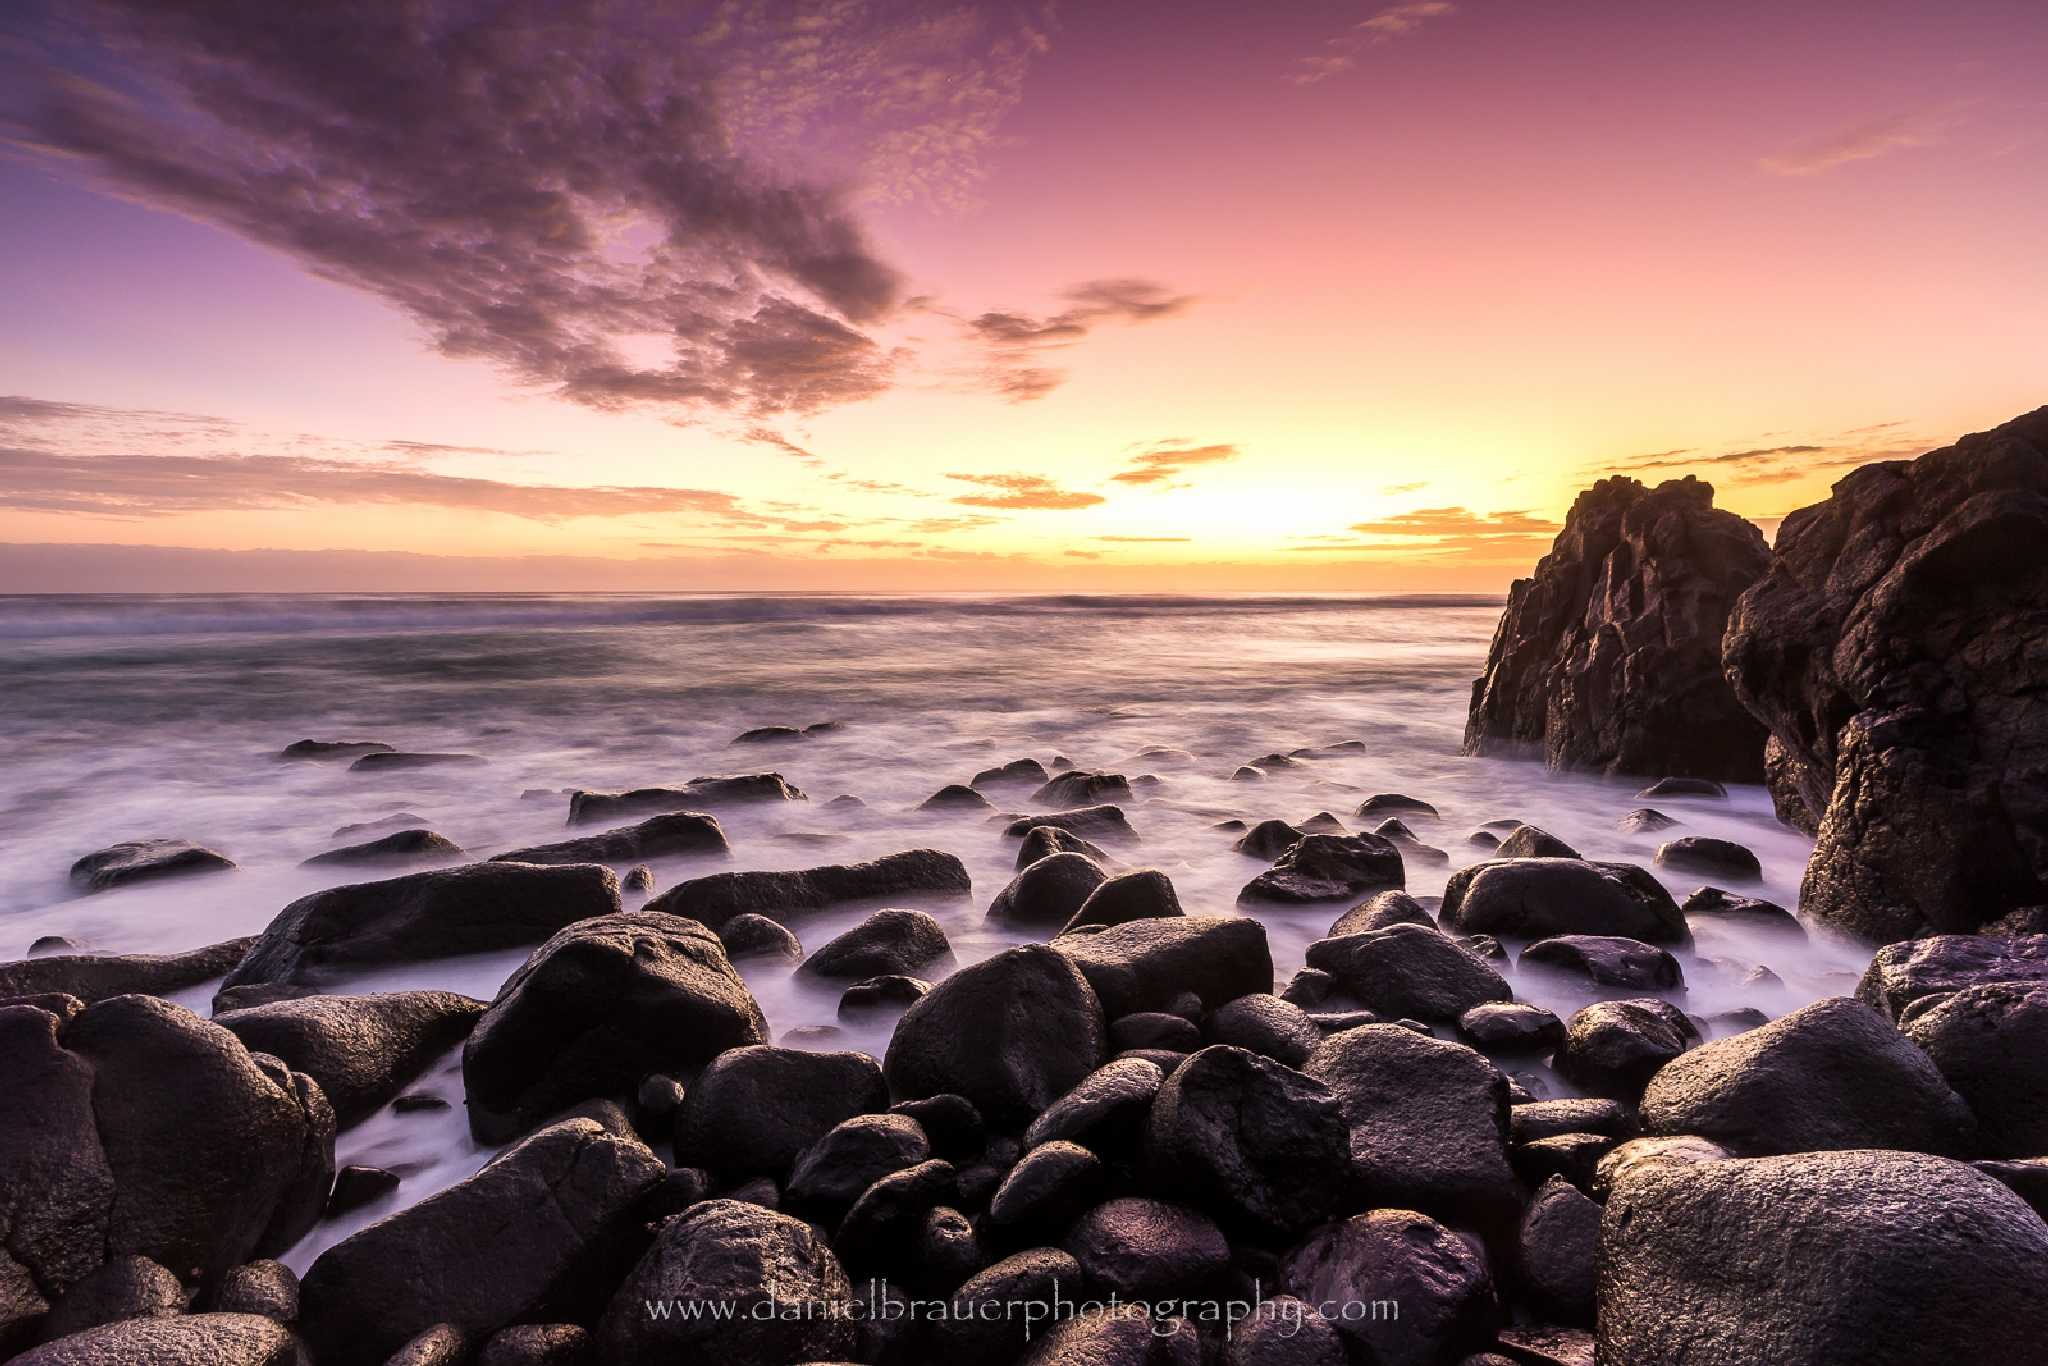 Burleigh Morning Glow by Daniel Brauer